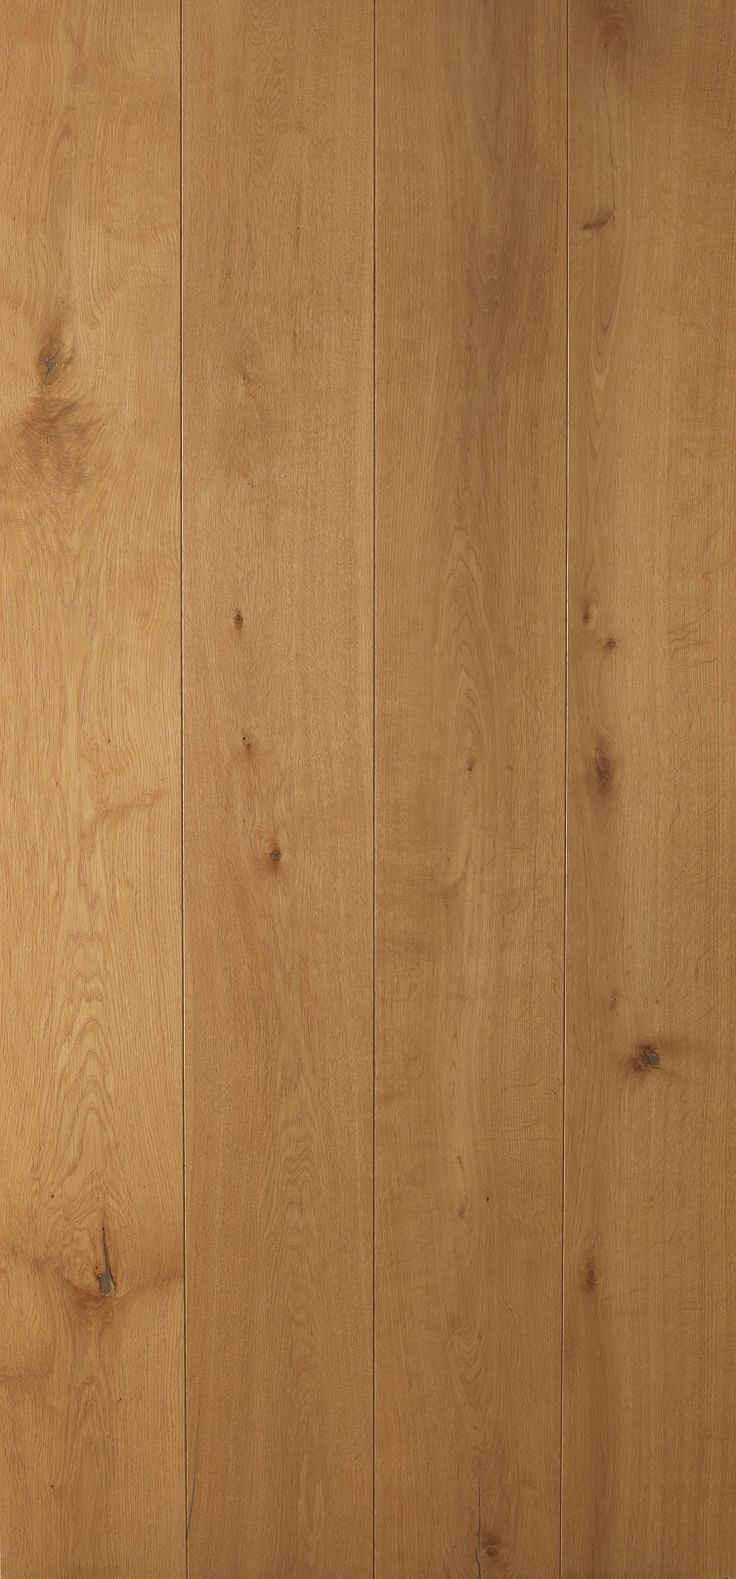 Eiken duoplank, blank geolied. Natural collectie: ALABAMA 26 cm breed